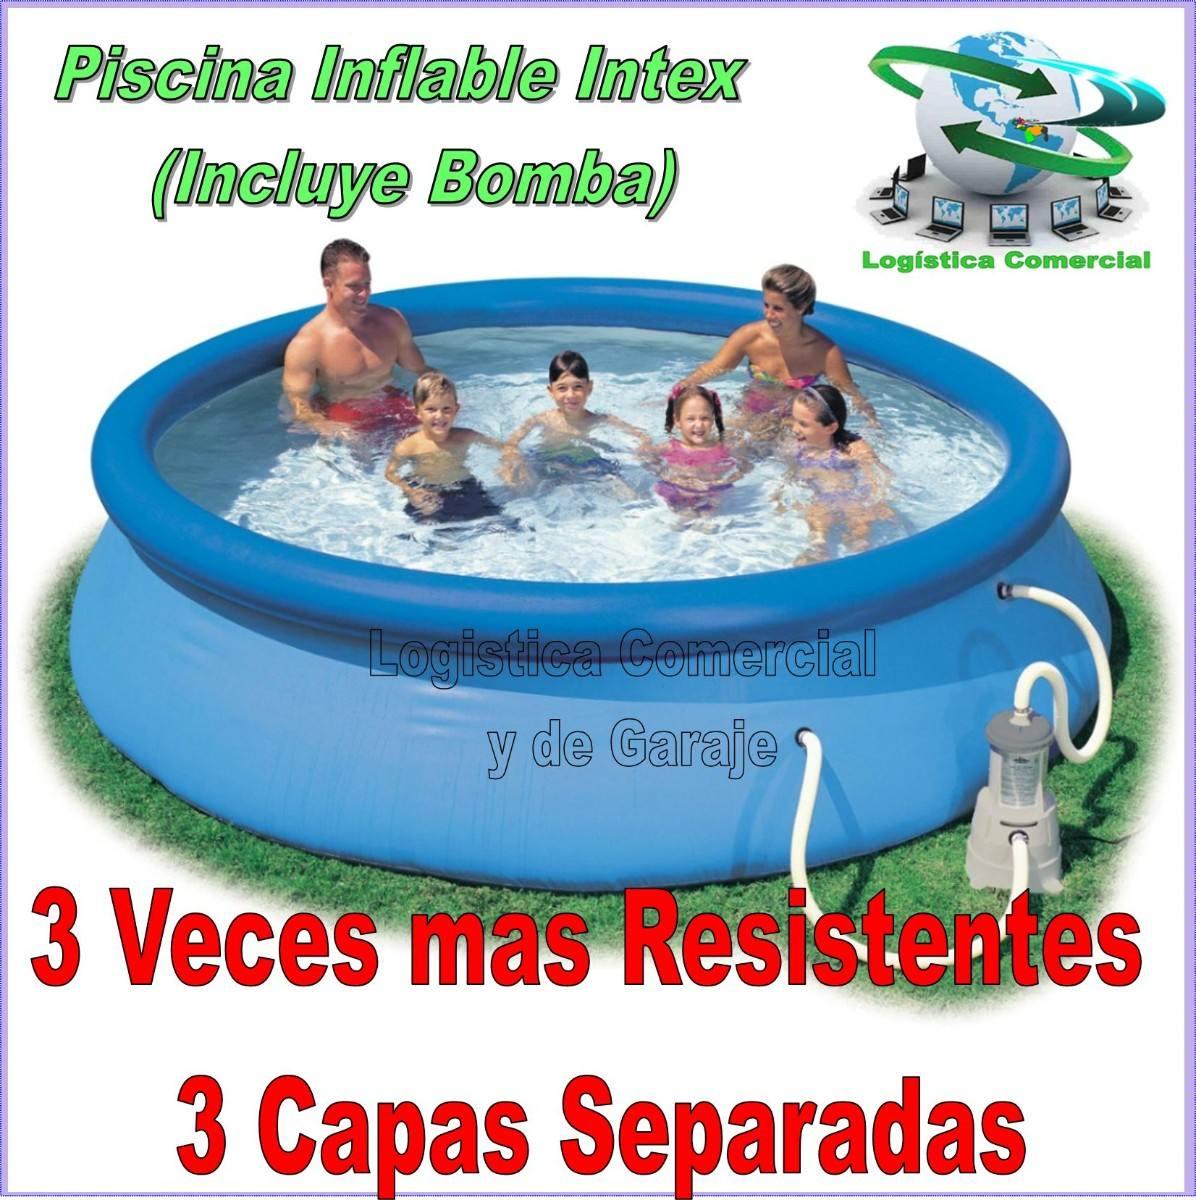 Pin bomba filtrante intex ltsh piscina estrutural on pinterest for Piscina inflable intex